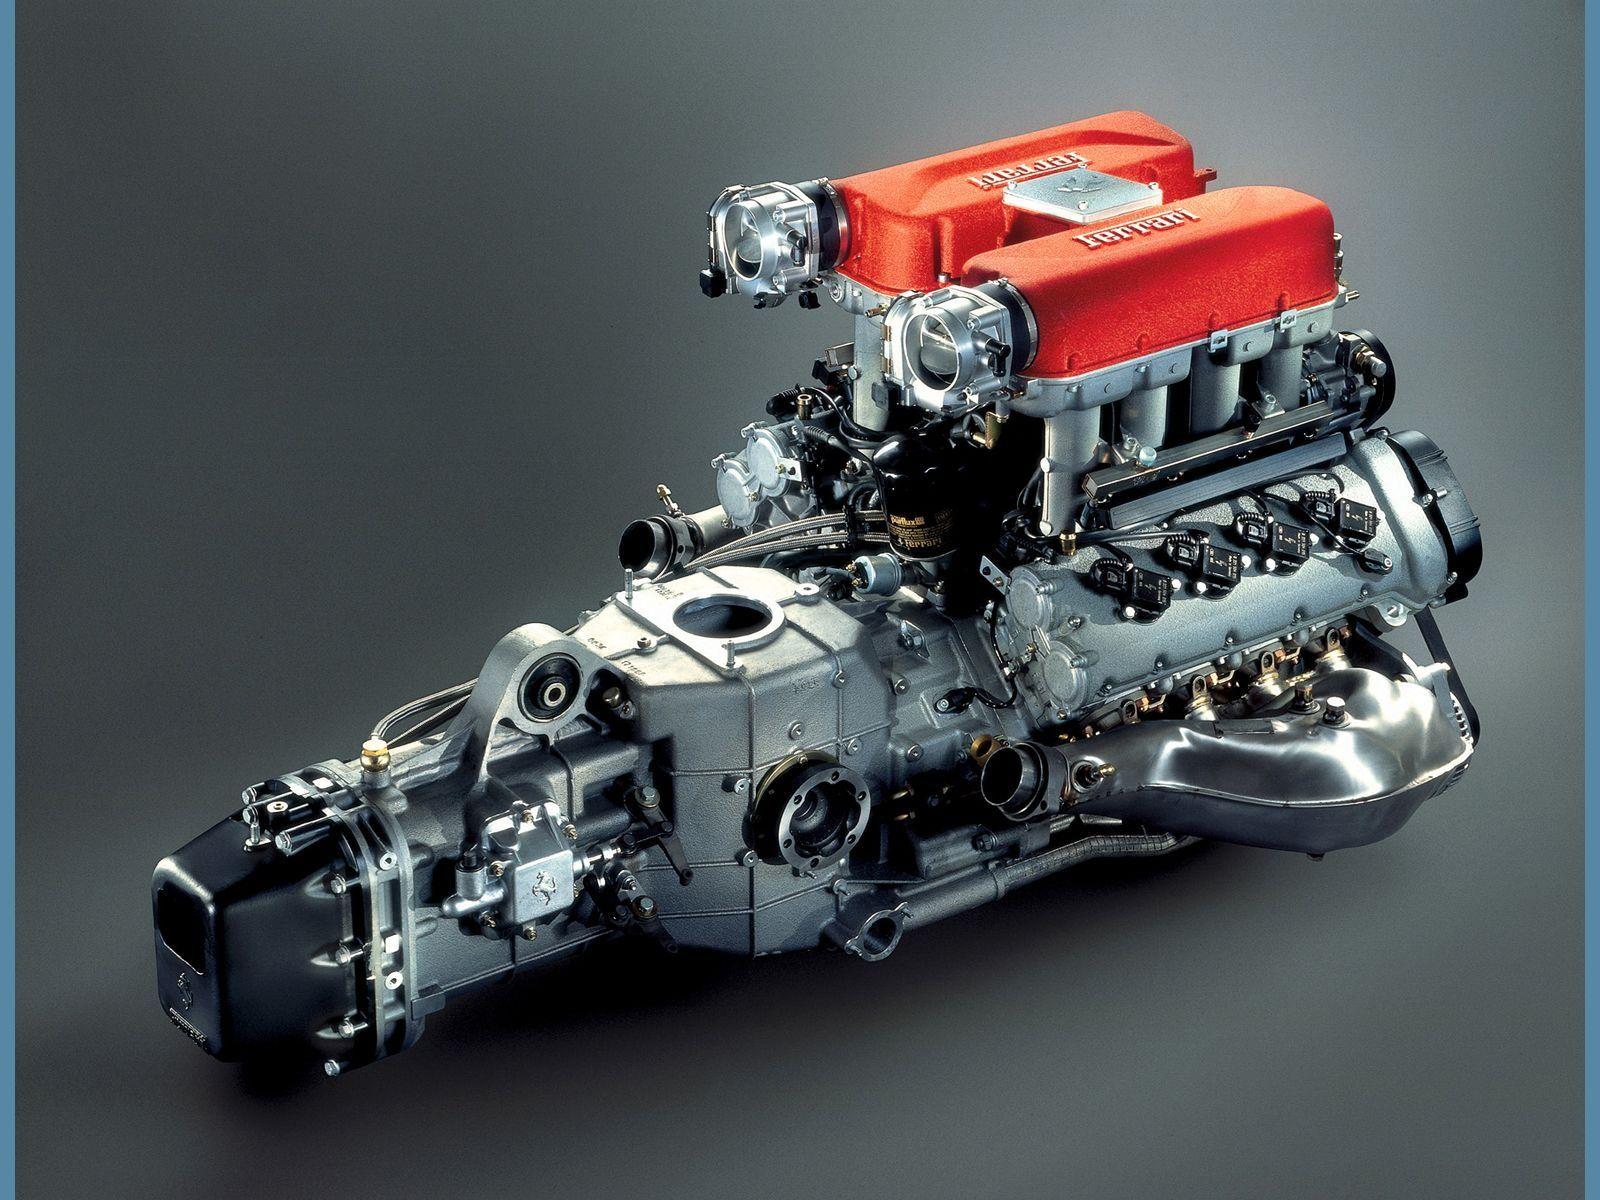 Ferrari 360 Modena Engine - 400bhp @ 8500rpm Redline 3 7L (225ci) 0